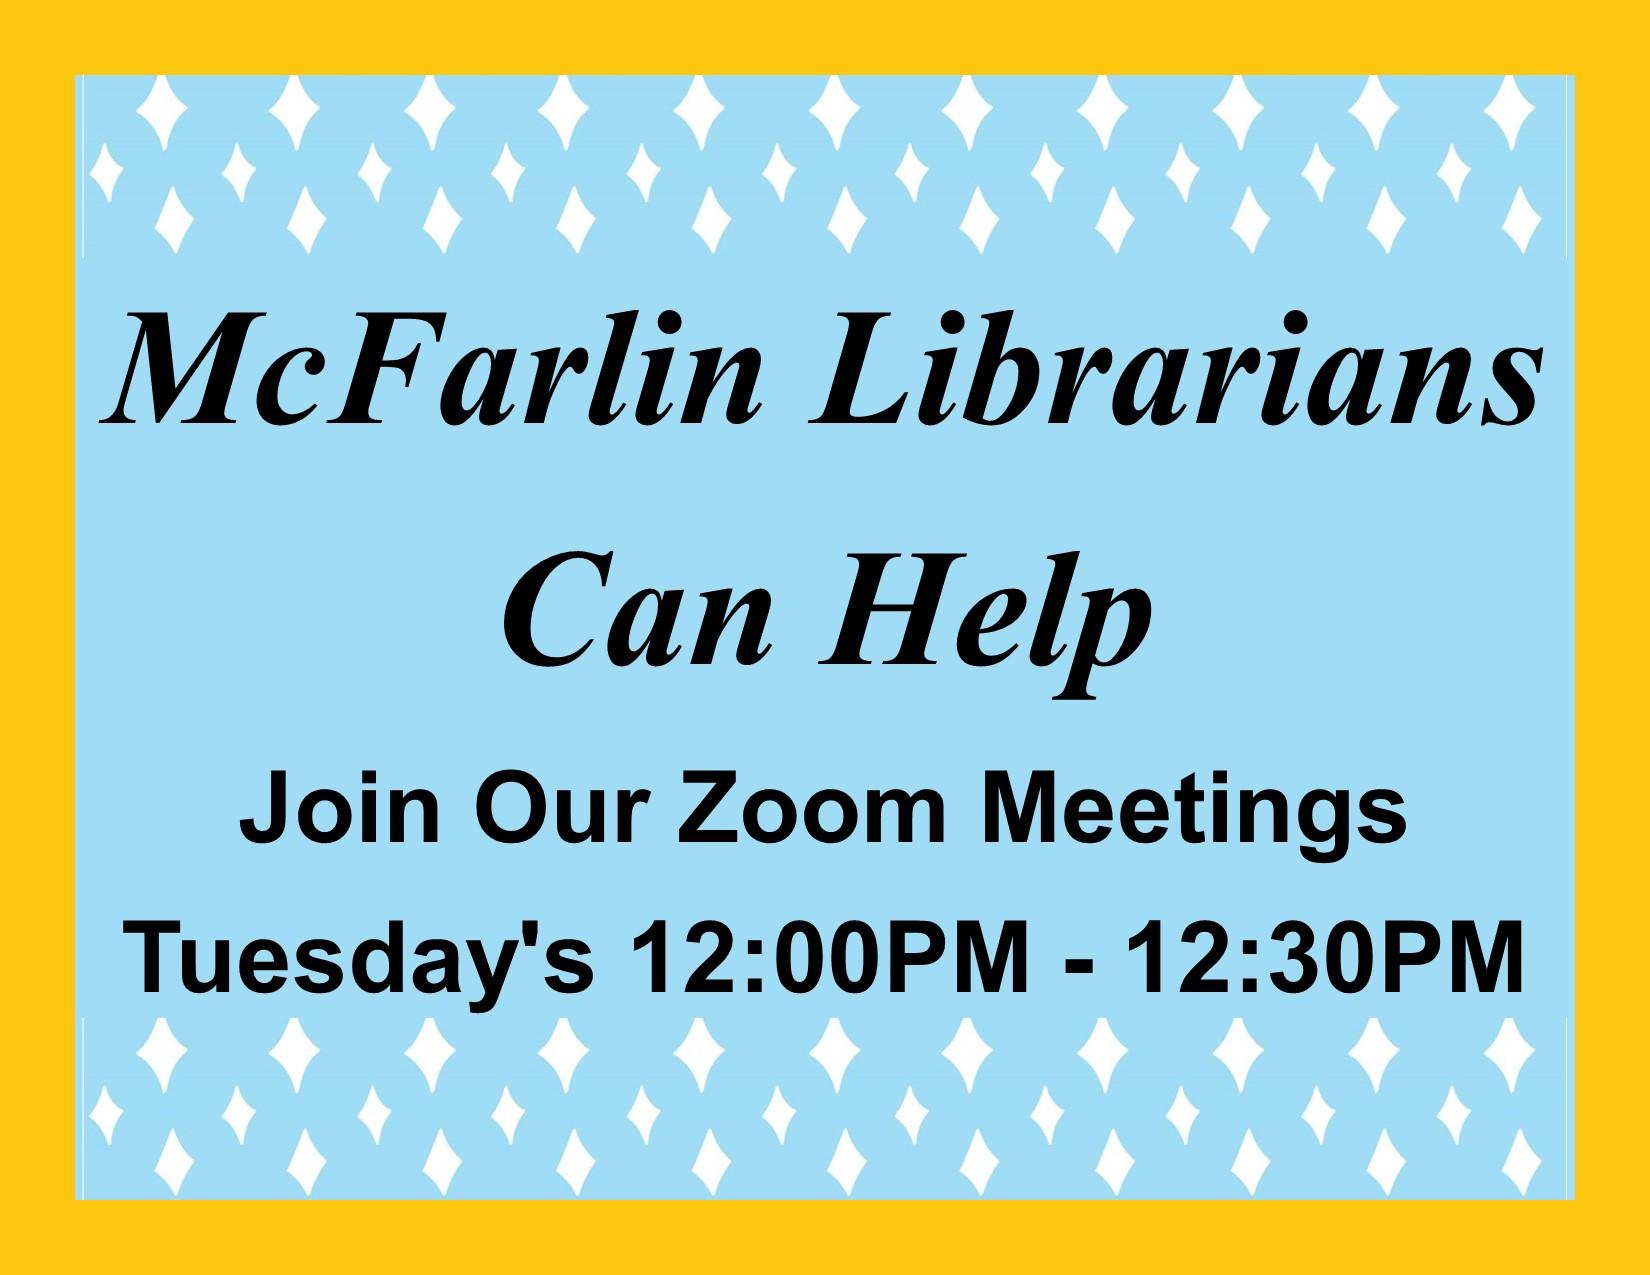 Library Zoom meetings flyer